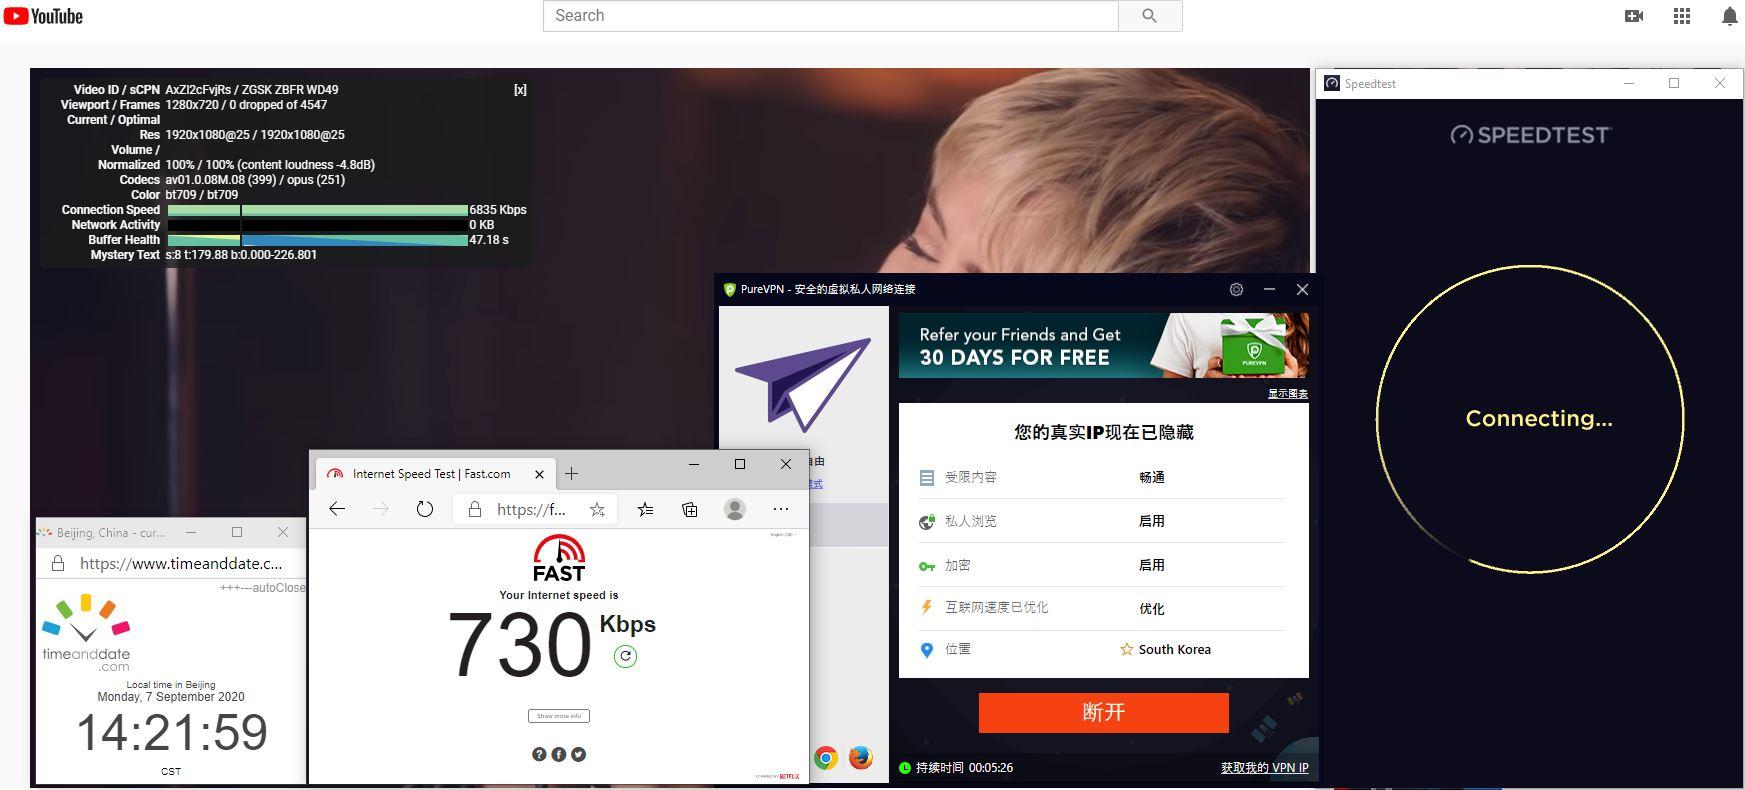 Windows10 PureVPN South Korea 中国VPN 翻墙 科学上网 翻墙速度测试 - 20200907